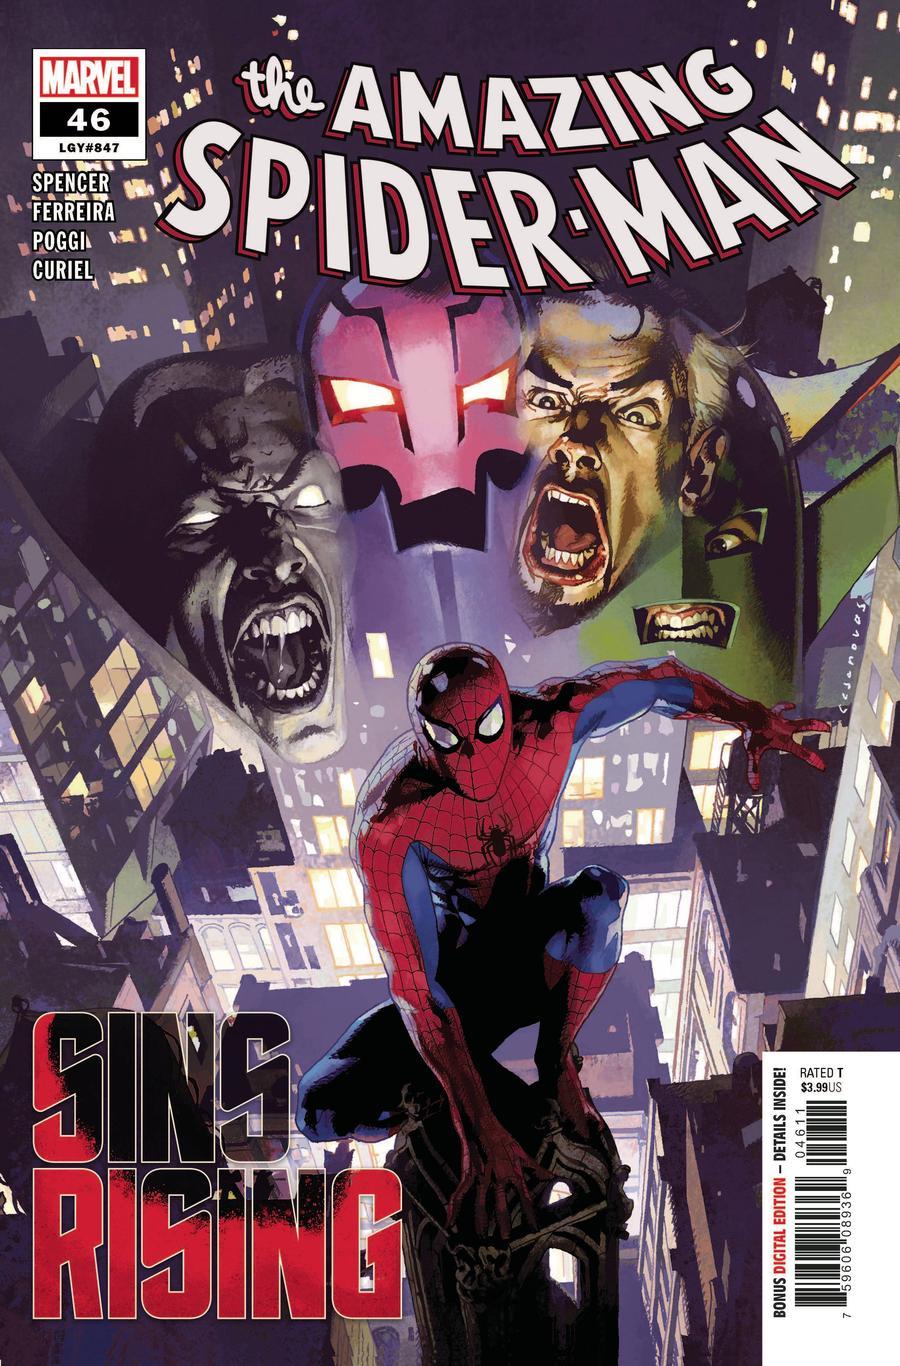 Amazing Spider-Man Vol 5 #46 Cover A Regular Josemaria Casanovas Cover